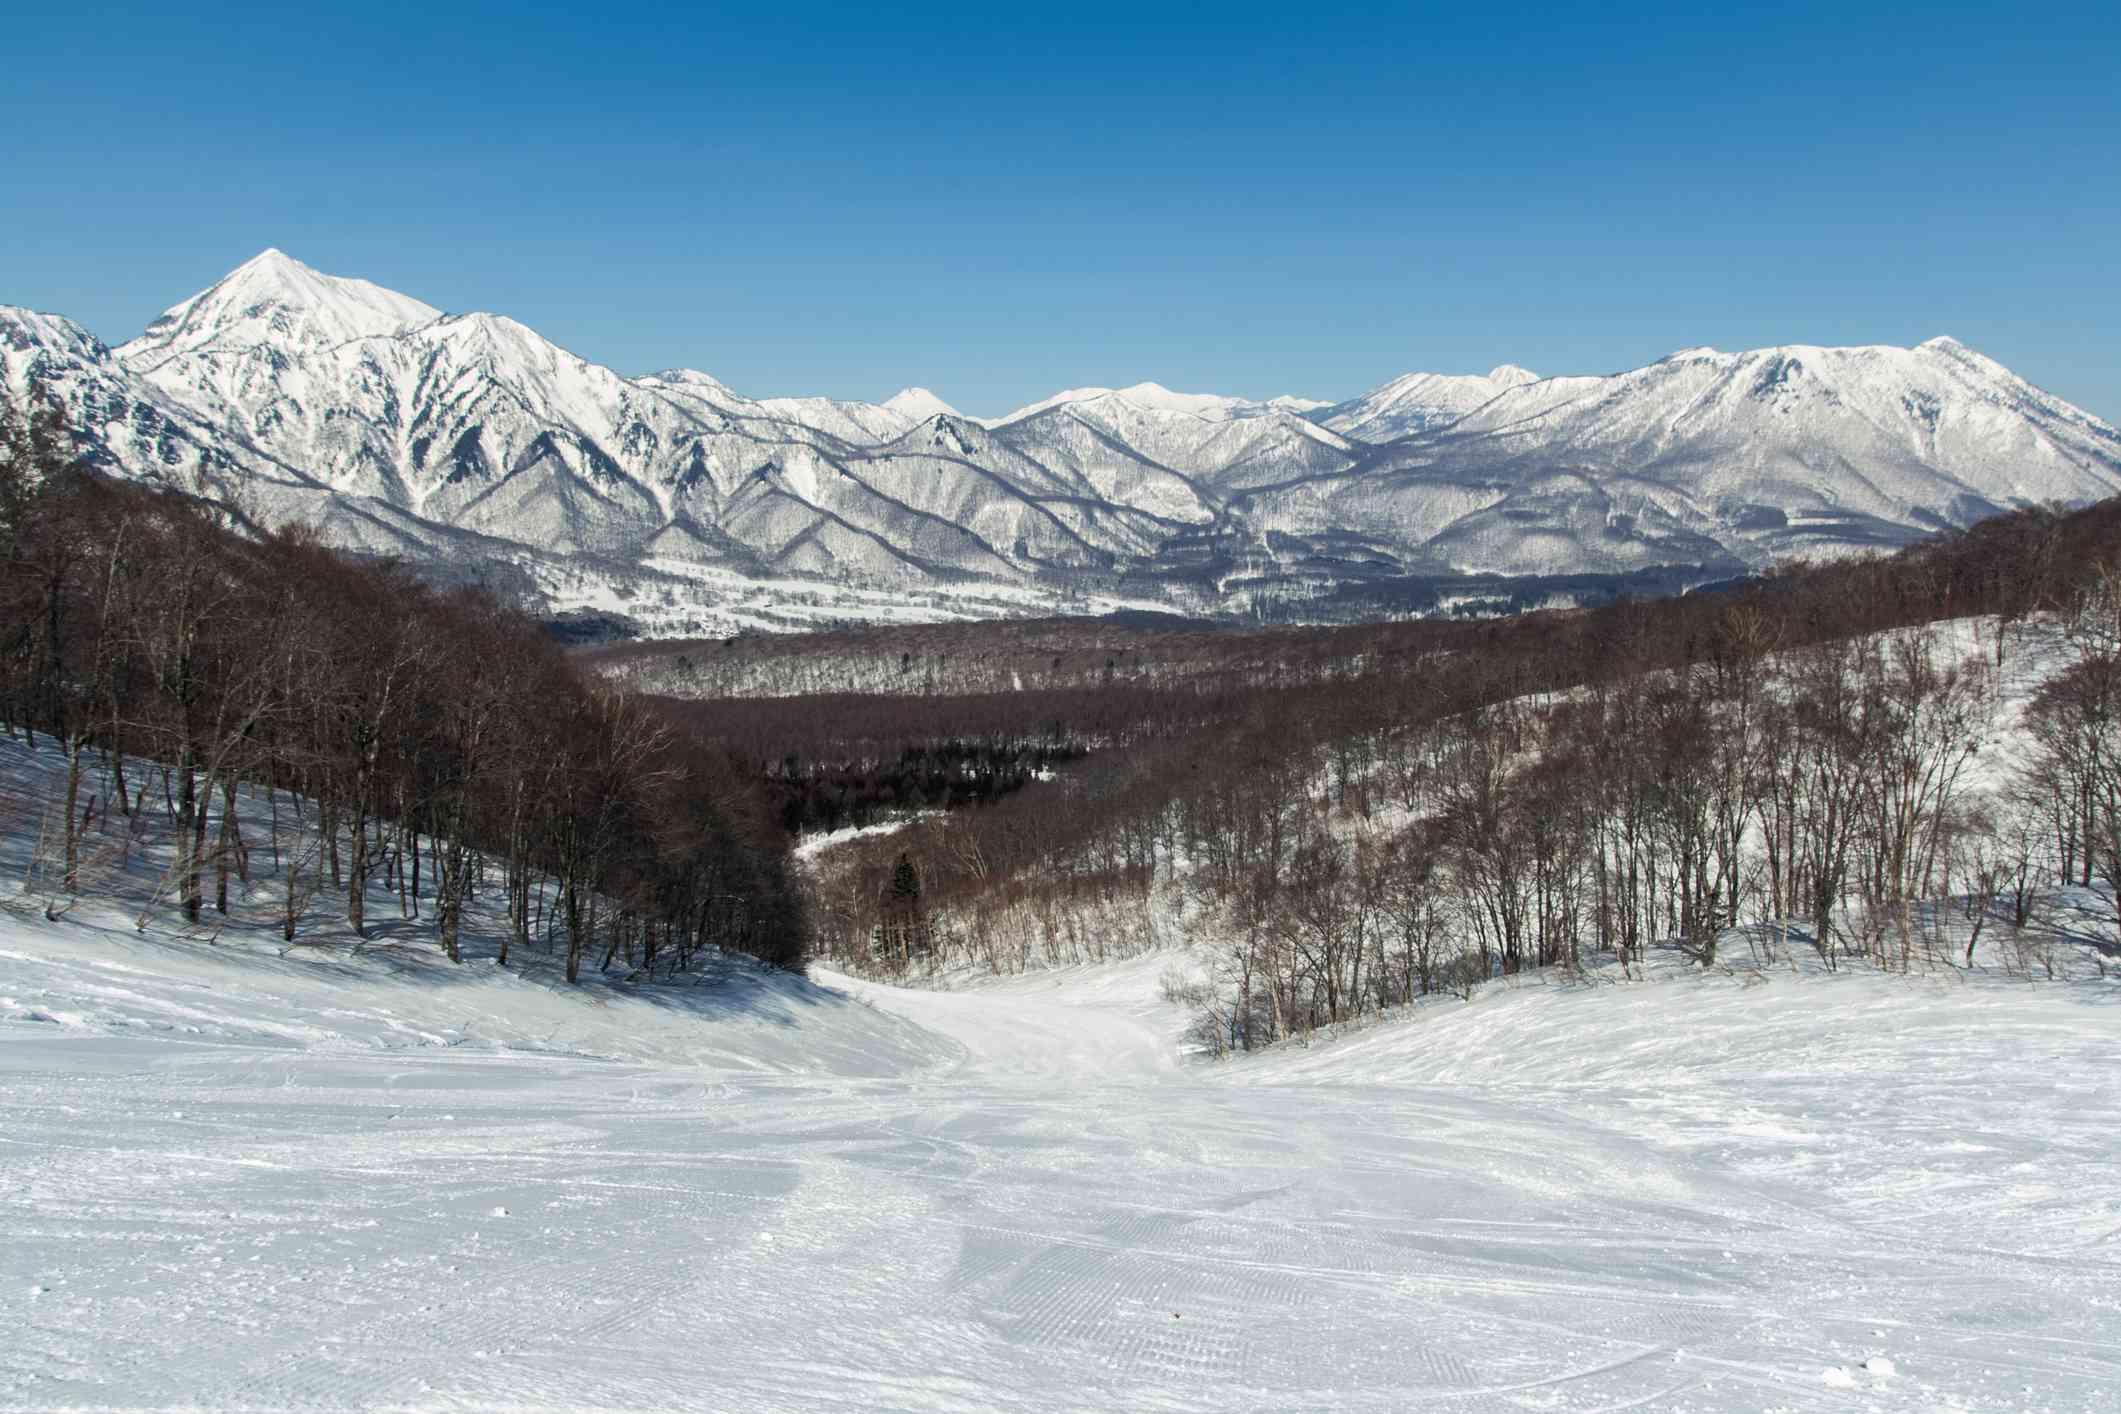 White mountains snow landscape at ski resort in Japan